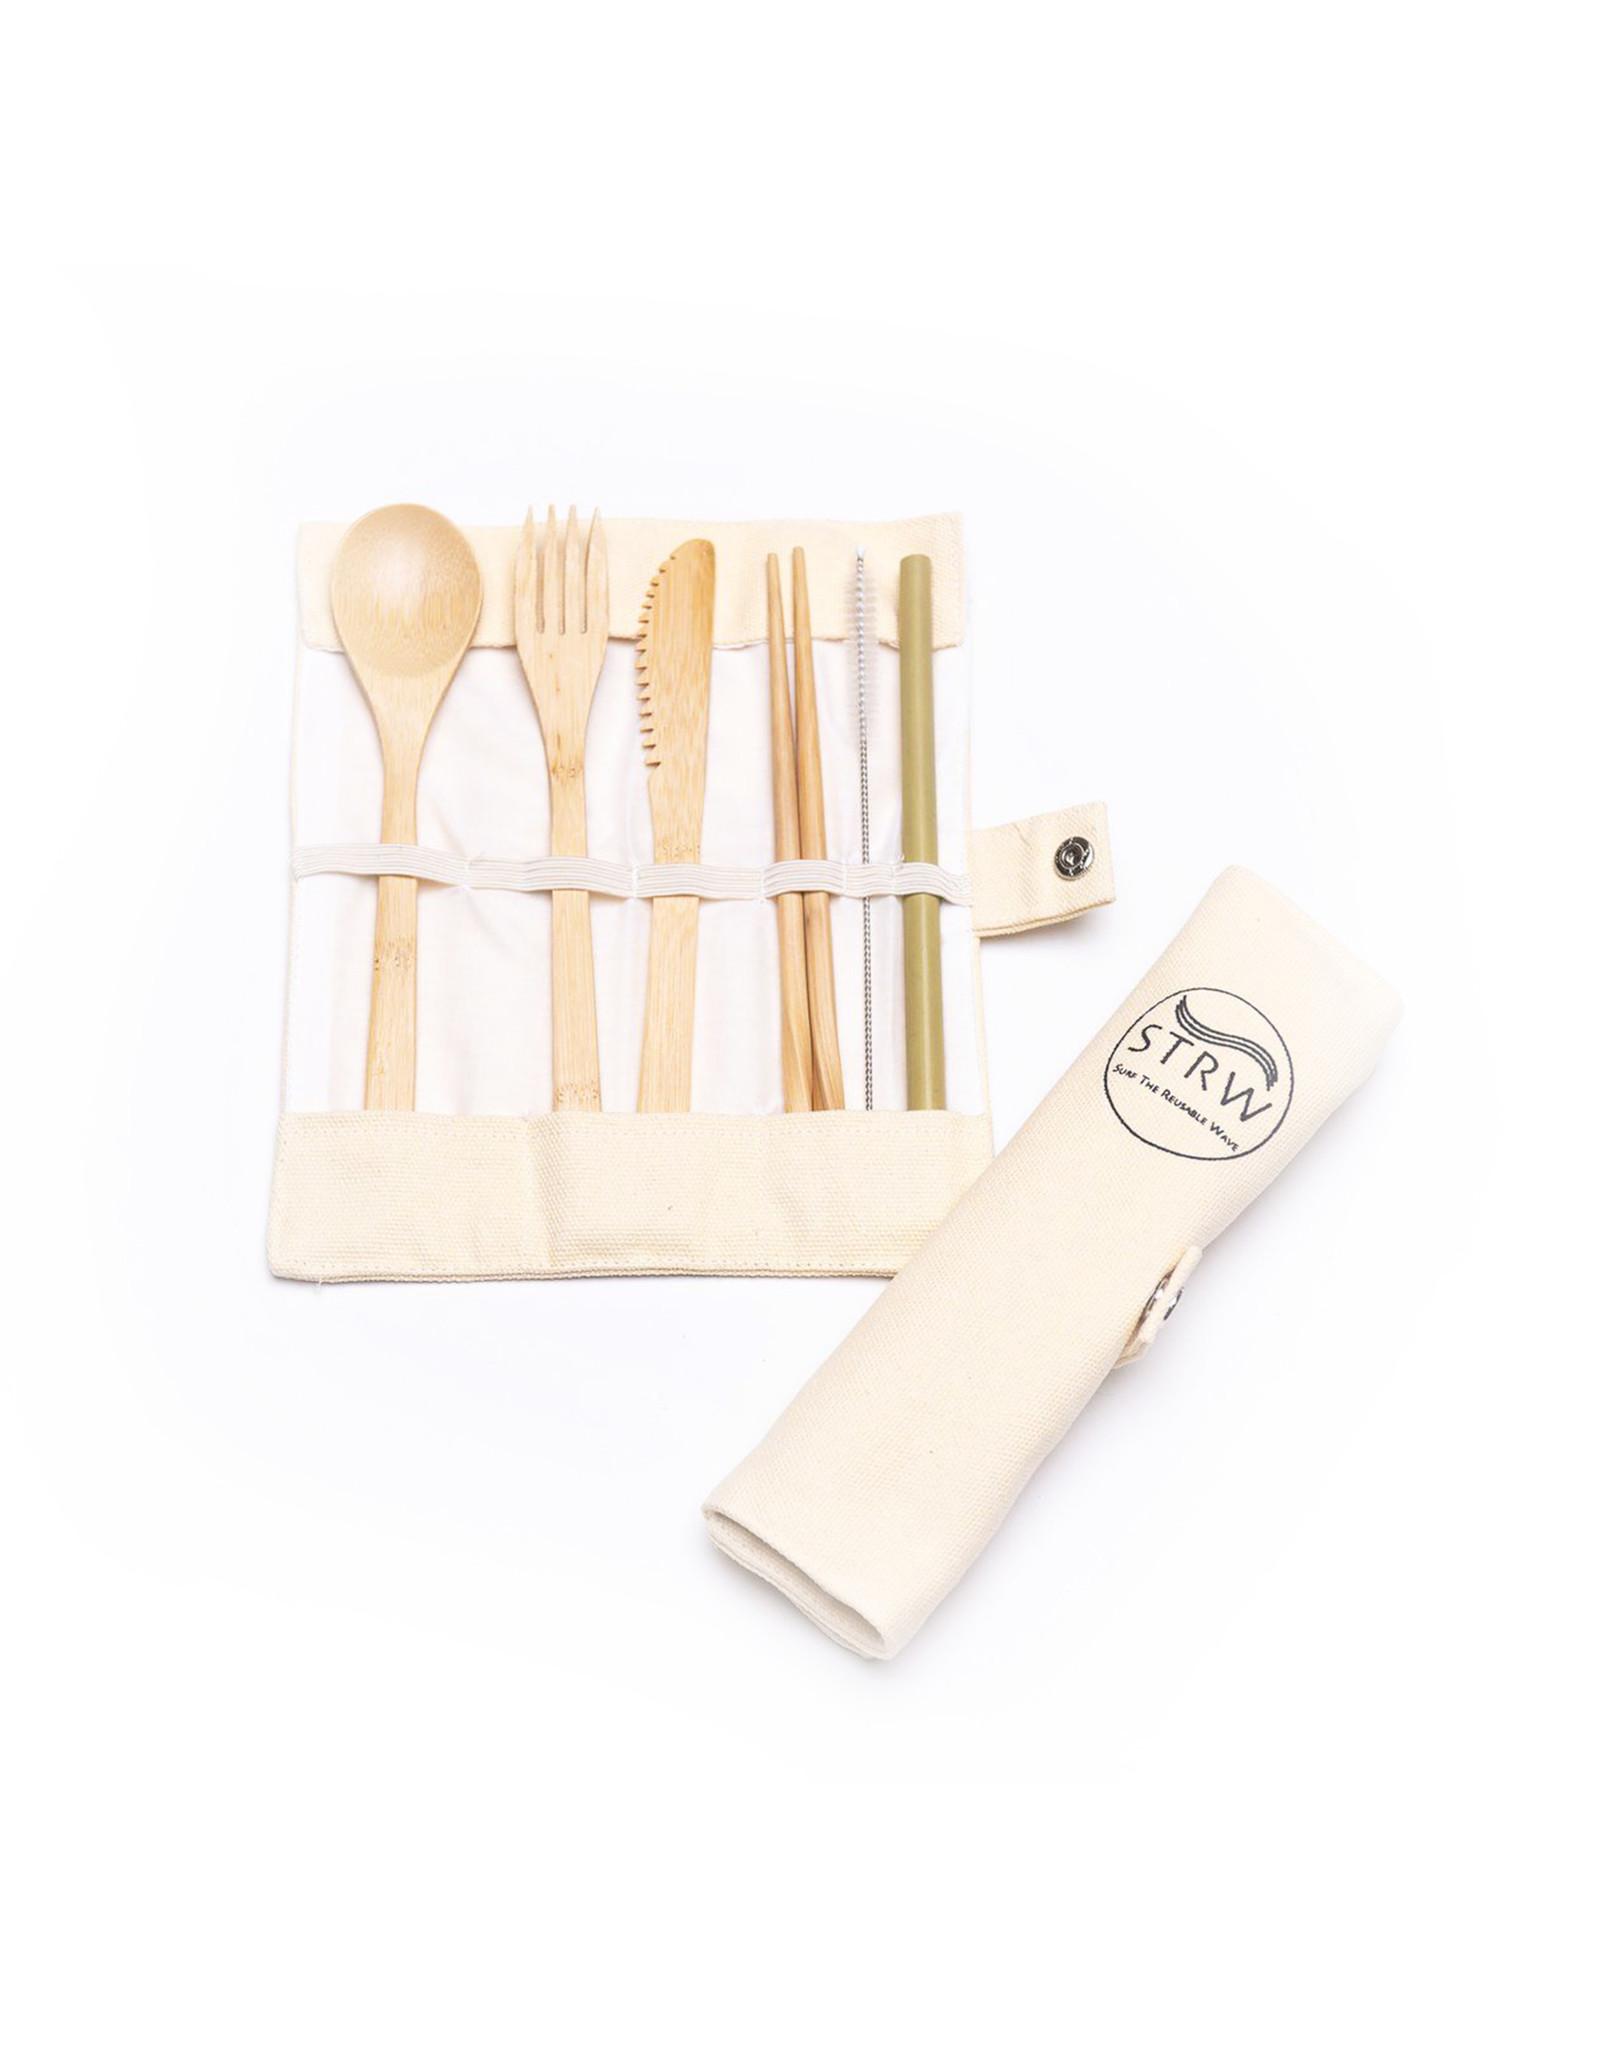 STRW Bamboo To-Go Cutlery Set